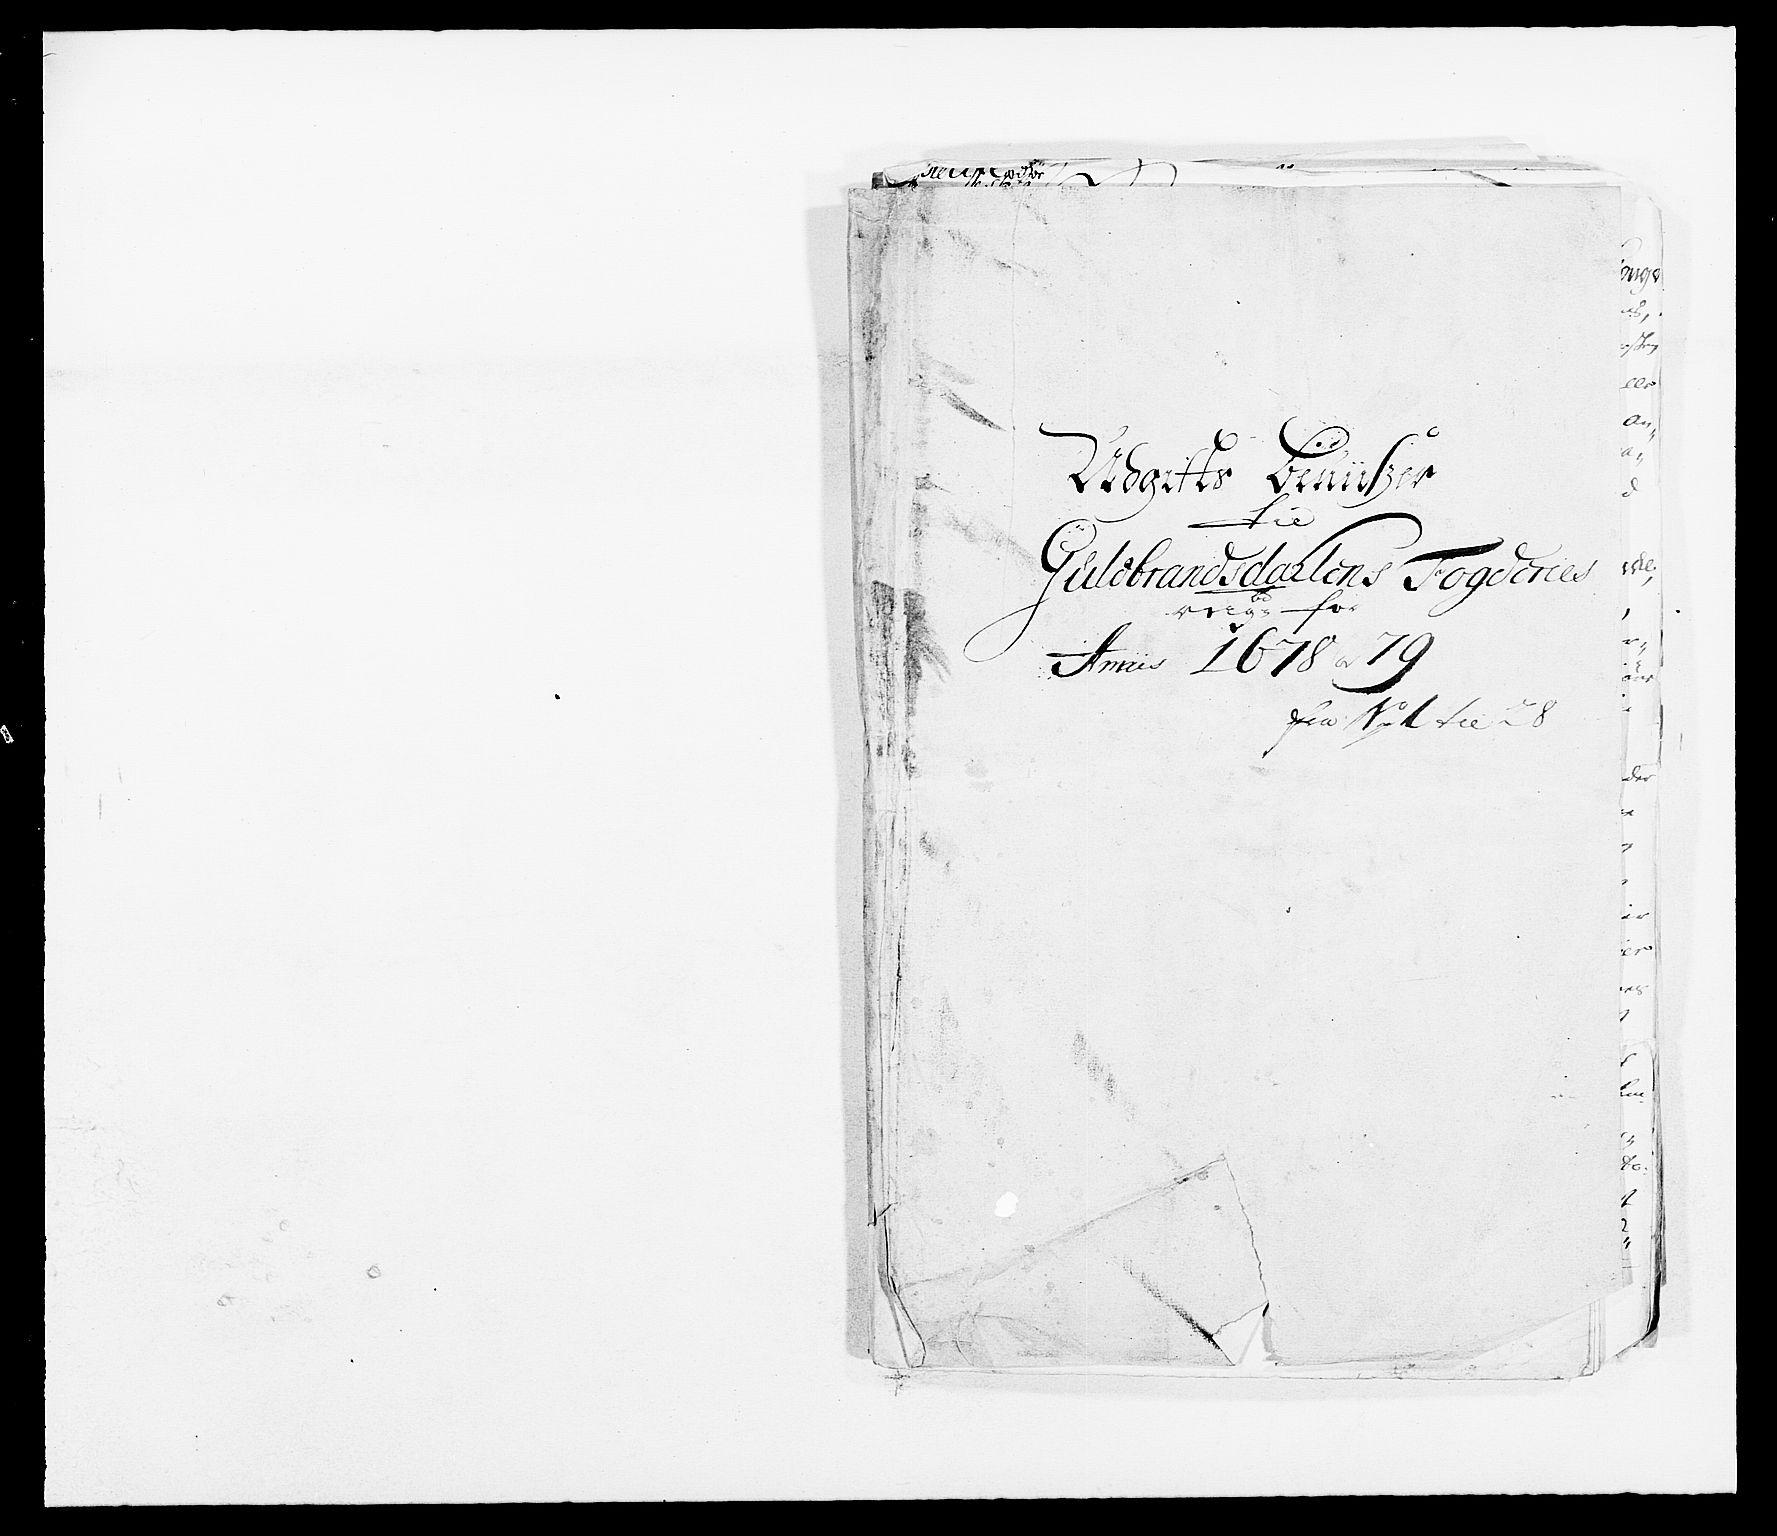 RA, Rentekammeret inntil 1814, Reviderte regnskaper, Fogderegnskap, R17/L1153: Fogderegnskap Gudbrandsdal, 1678-1679, s. 438